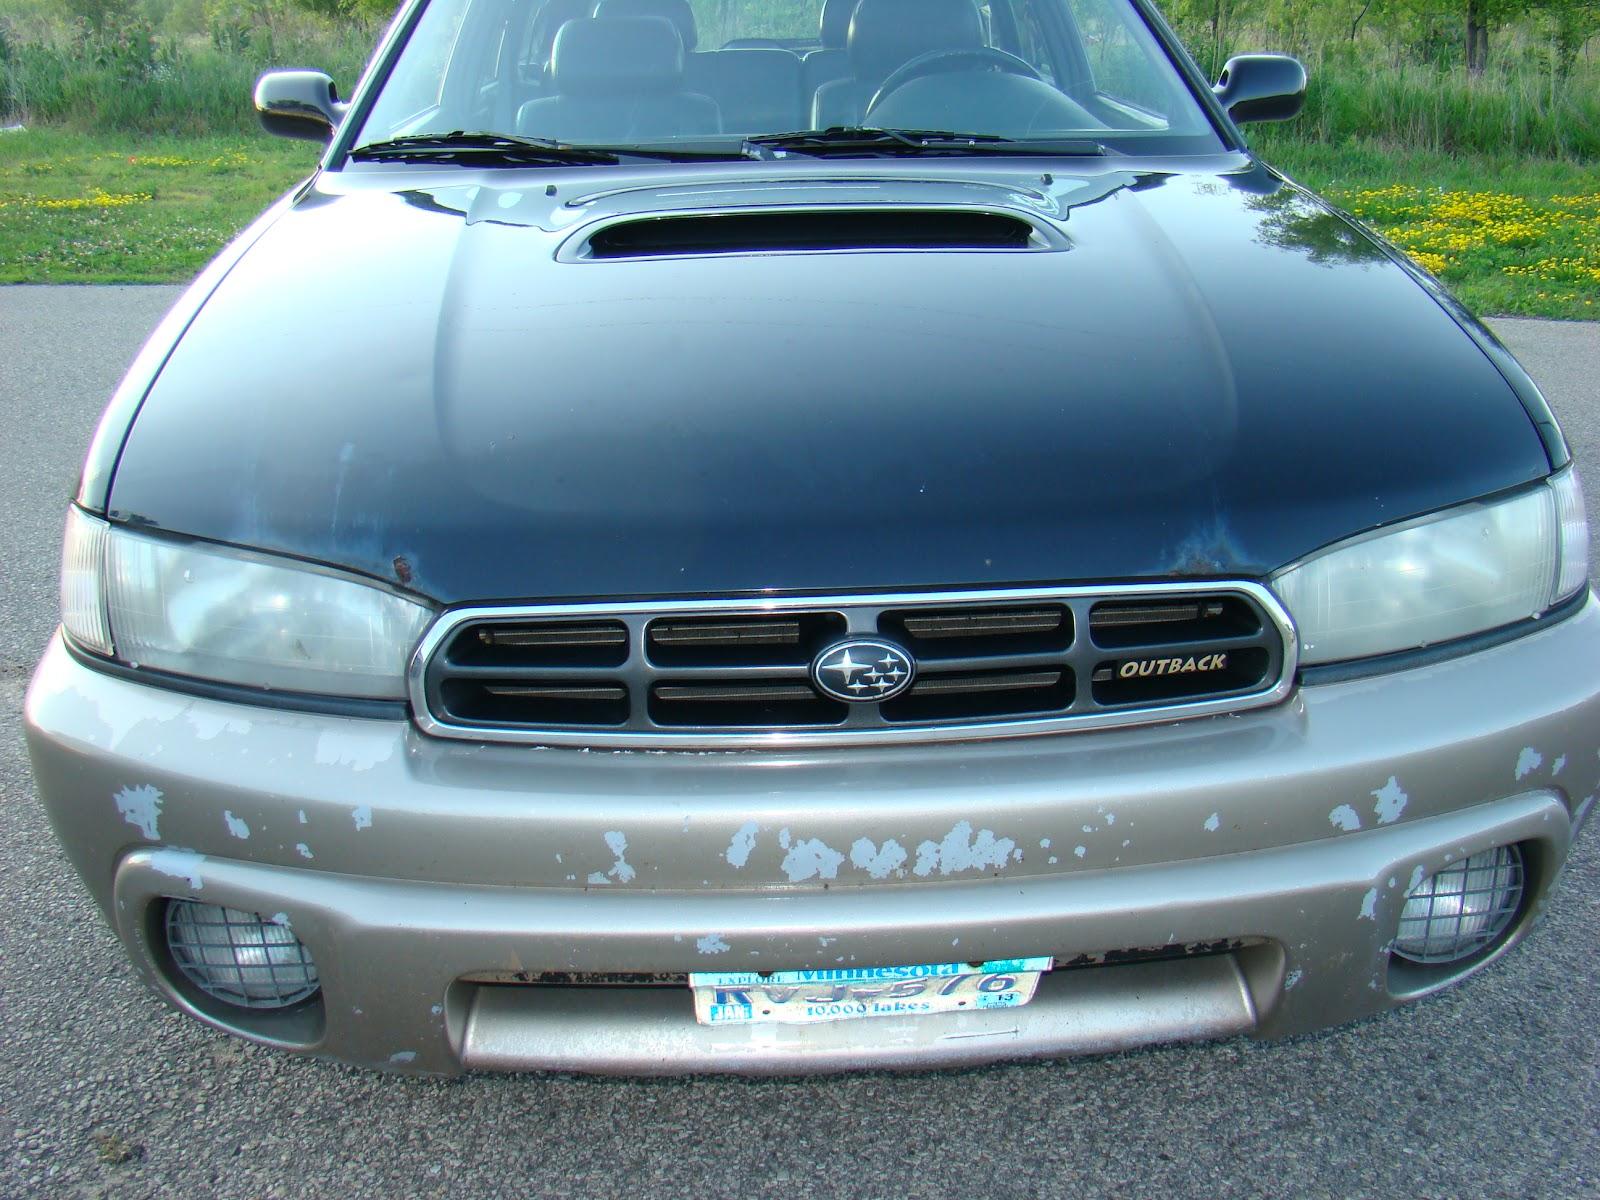 1997 Subaru Outback Radio Wiring Diagram Subwoofer 1998 Legacy Www Toyskids Co 2006 Impreza Stereo